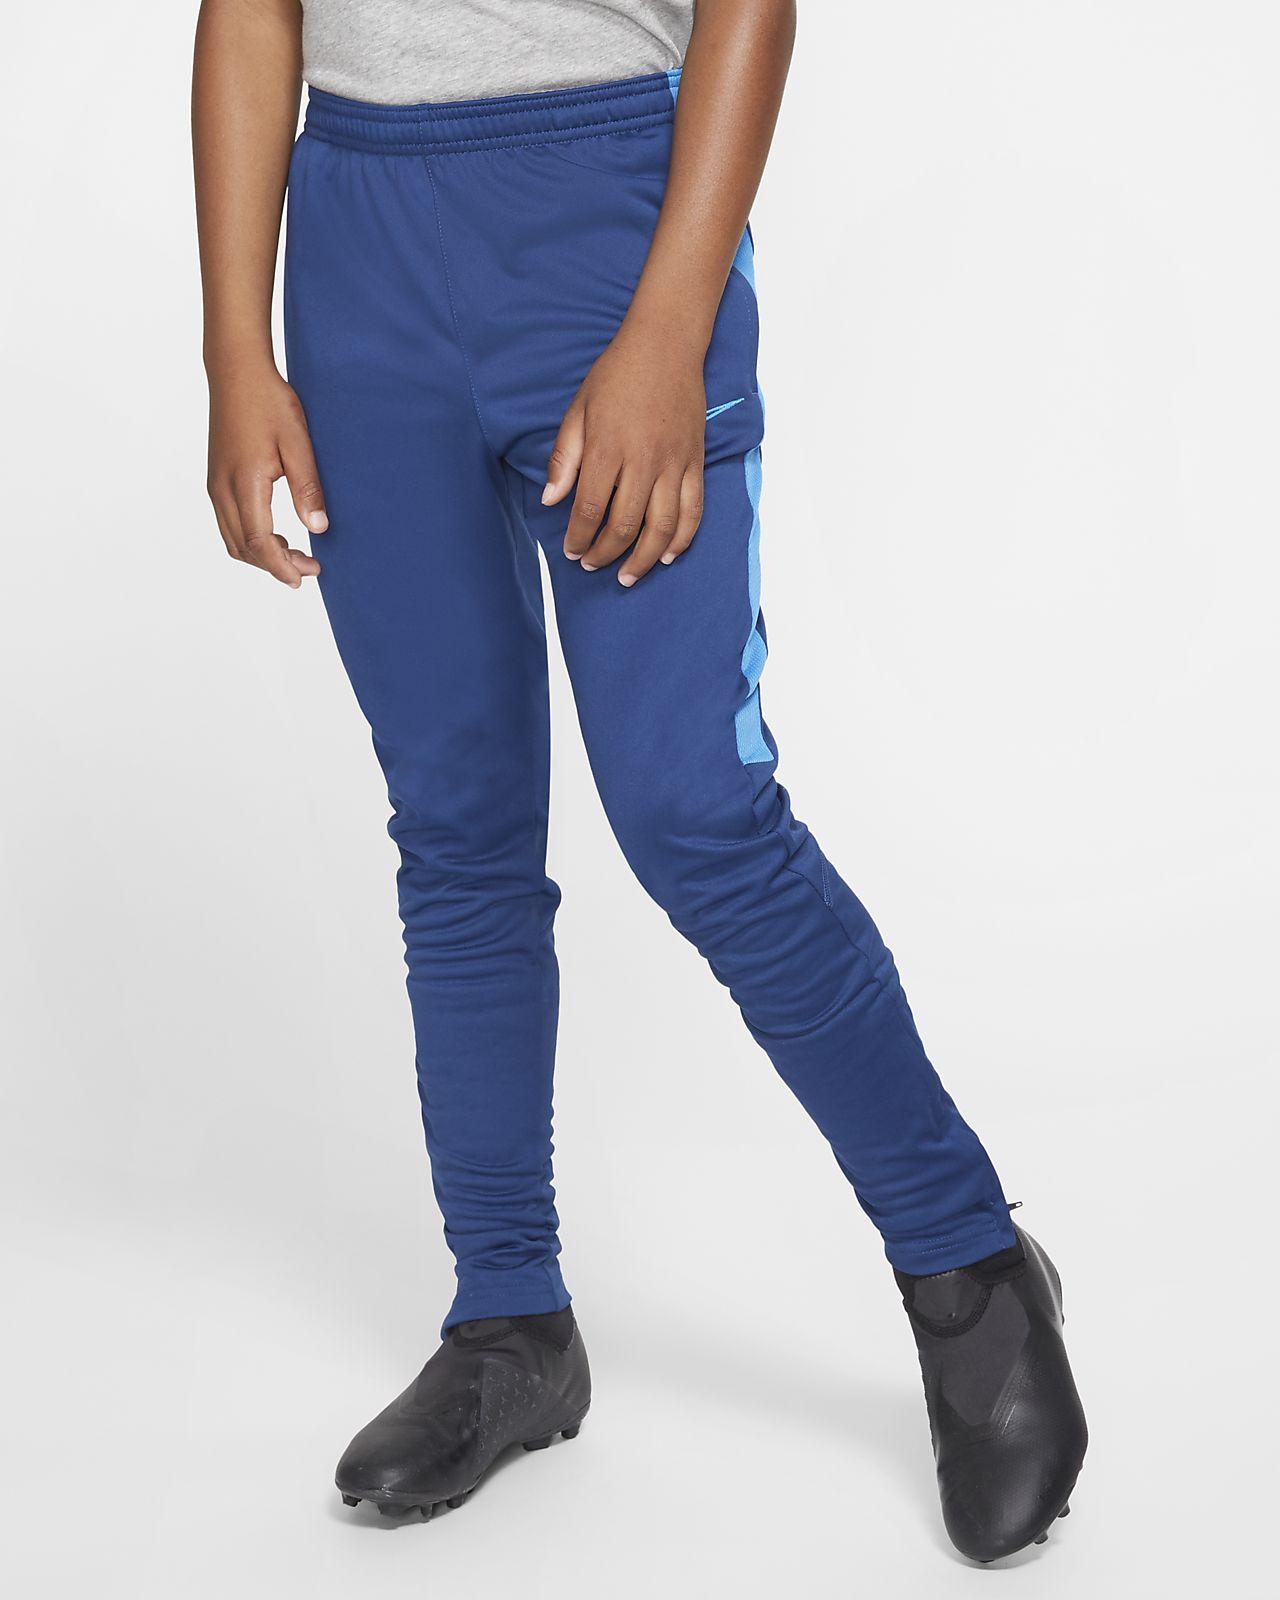 Nike Dri-FIT Academy Pantalón de fútbol - Niño/a